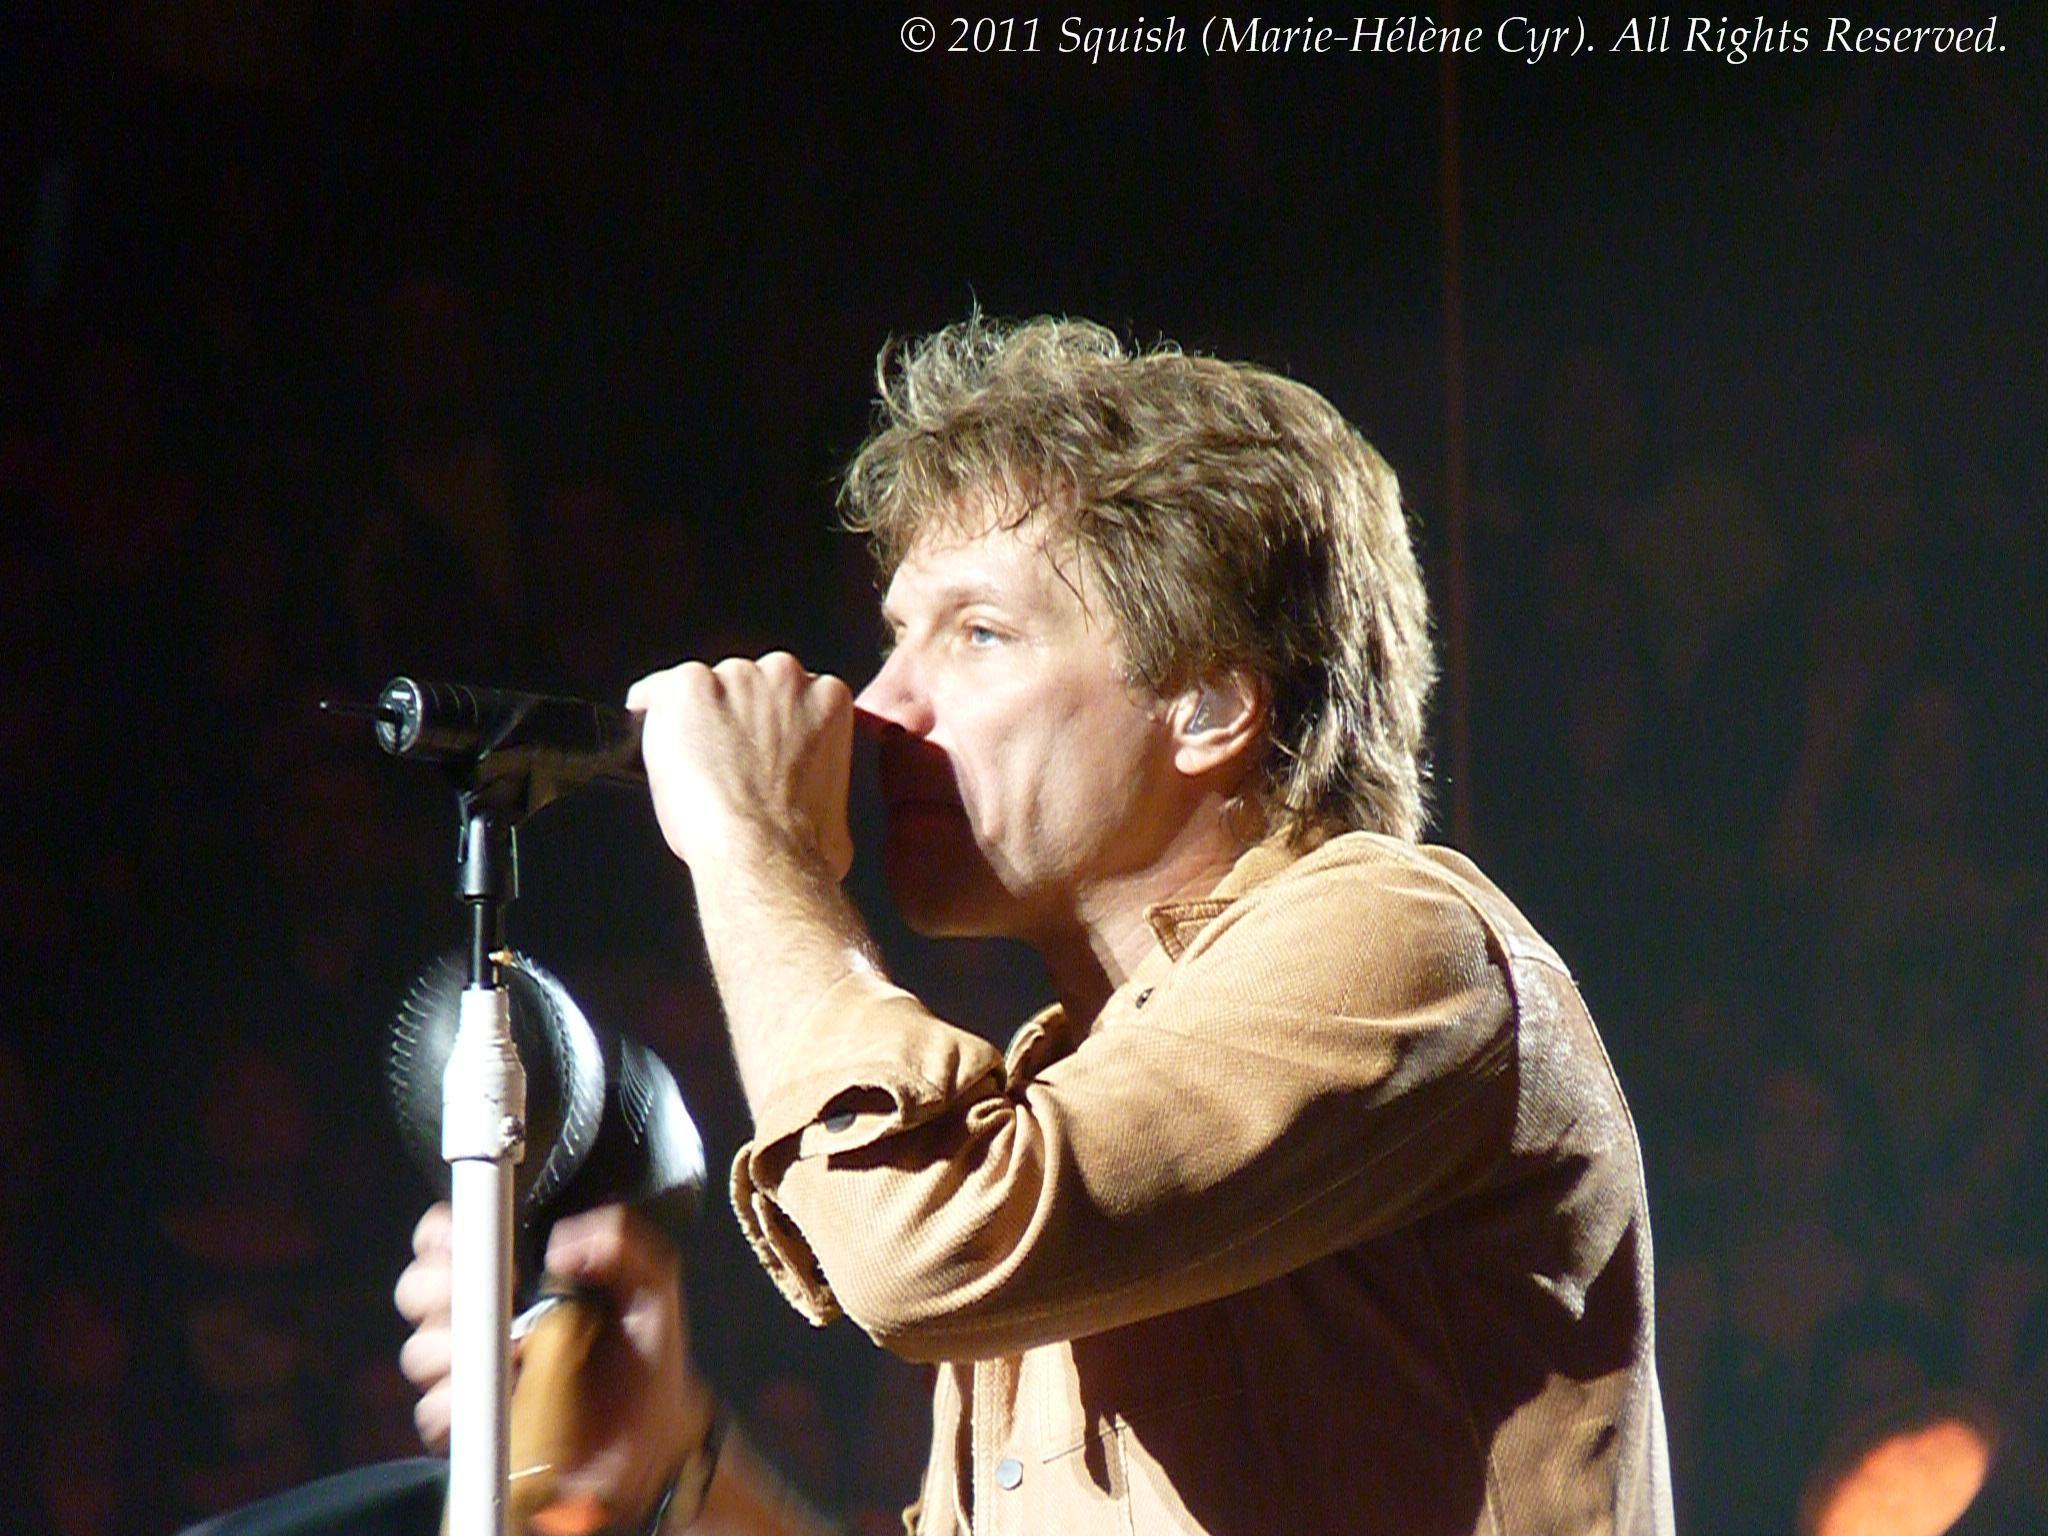 Bon Jovi - Centre Bell, Québec, Canada (18 février 2011)